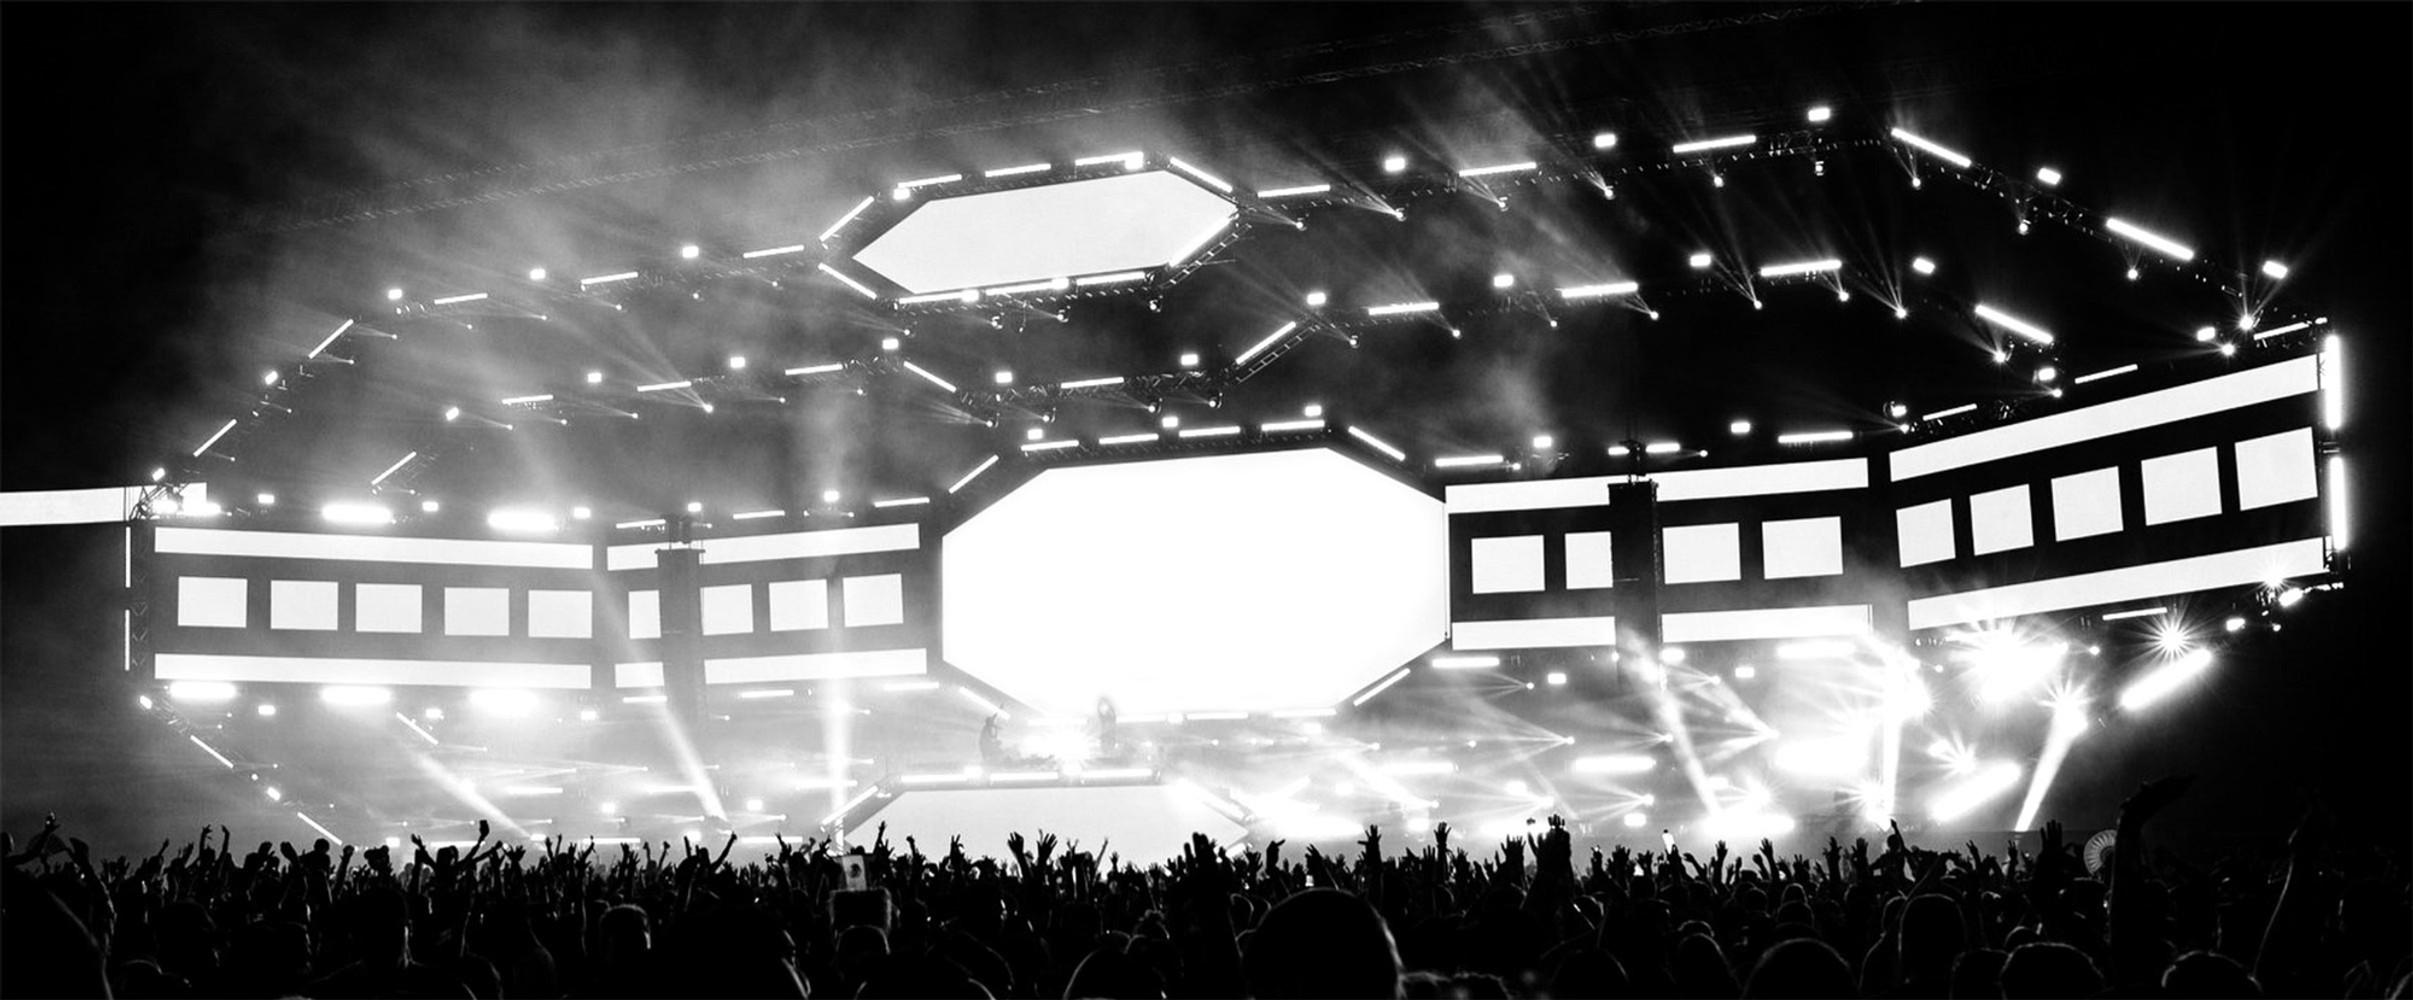 Contact Festival - 2018